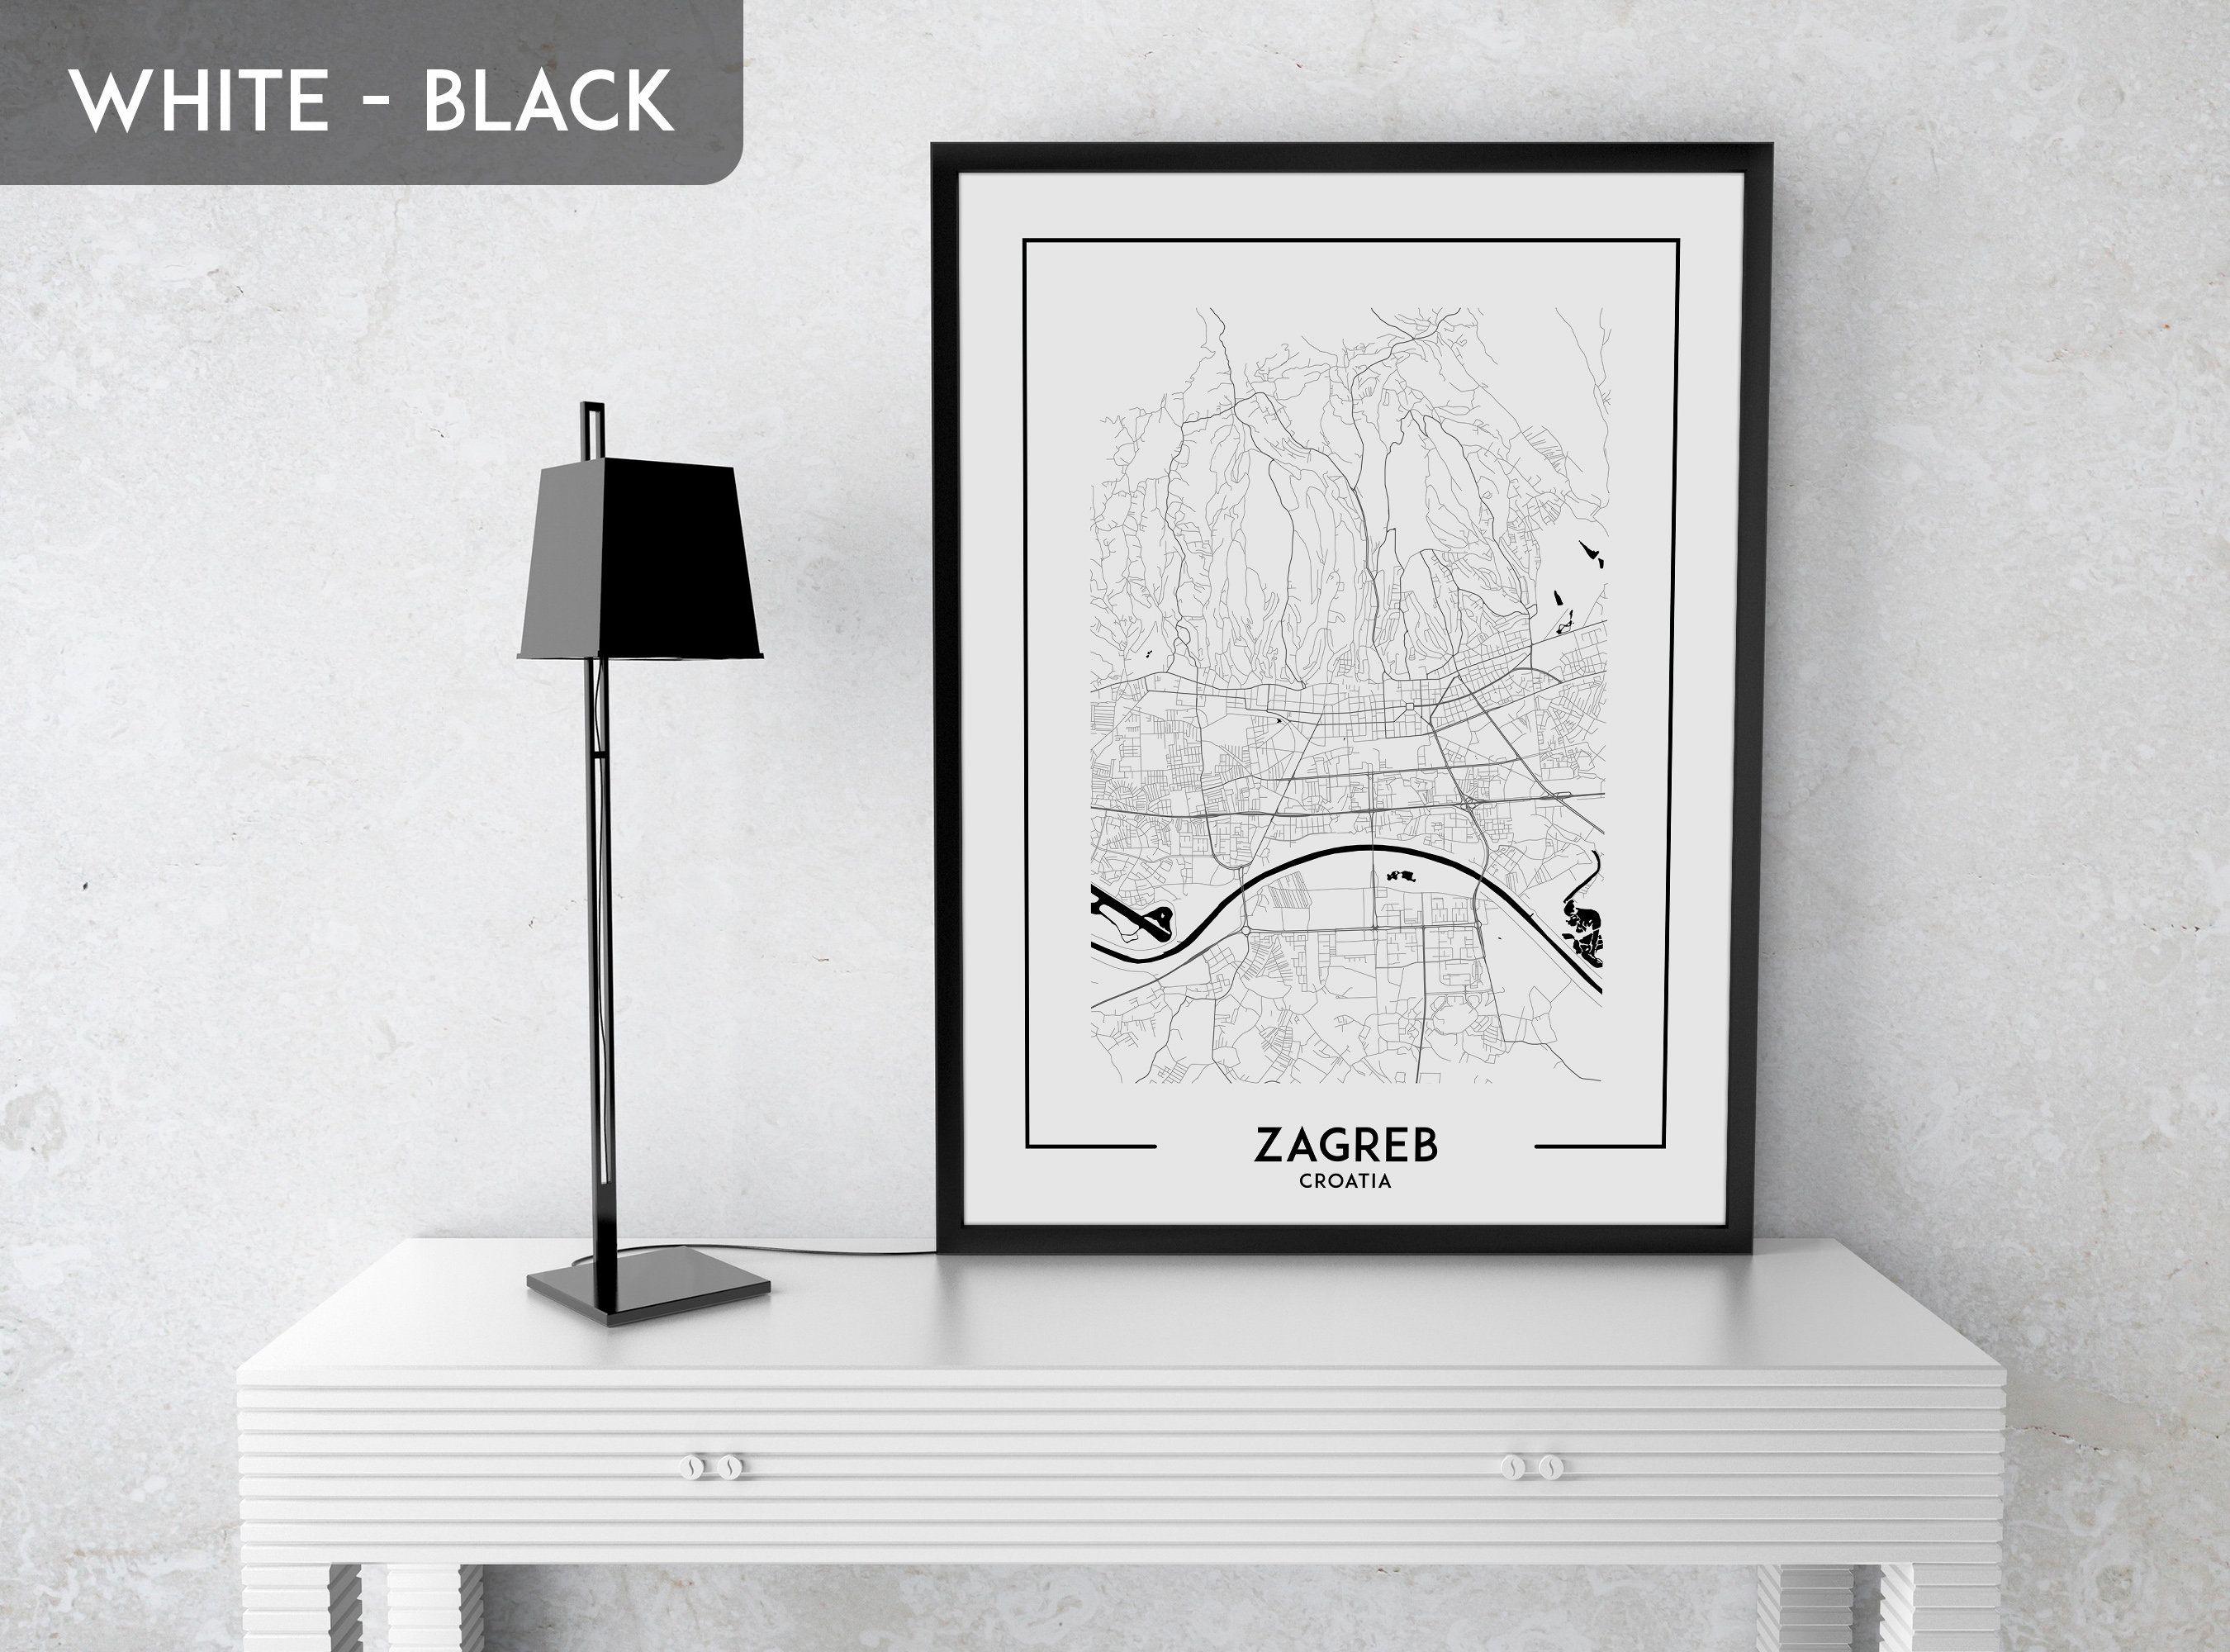 ZAGREB Croatia Map Poster Black White Wall Decor Design Modern Motto Swiss  Scandinavian Minimal Nordic Housewarming